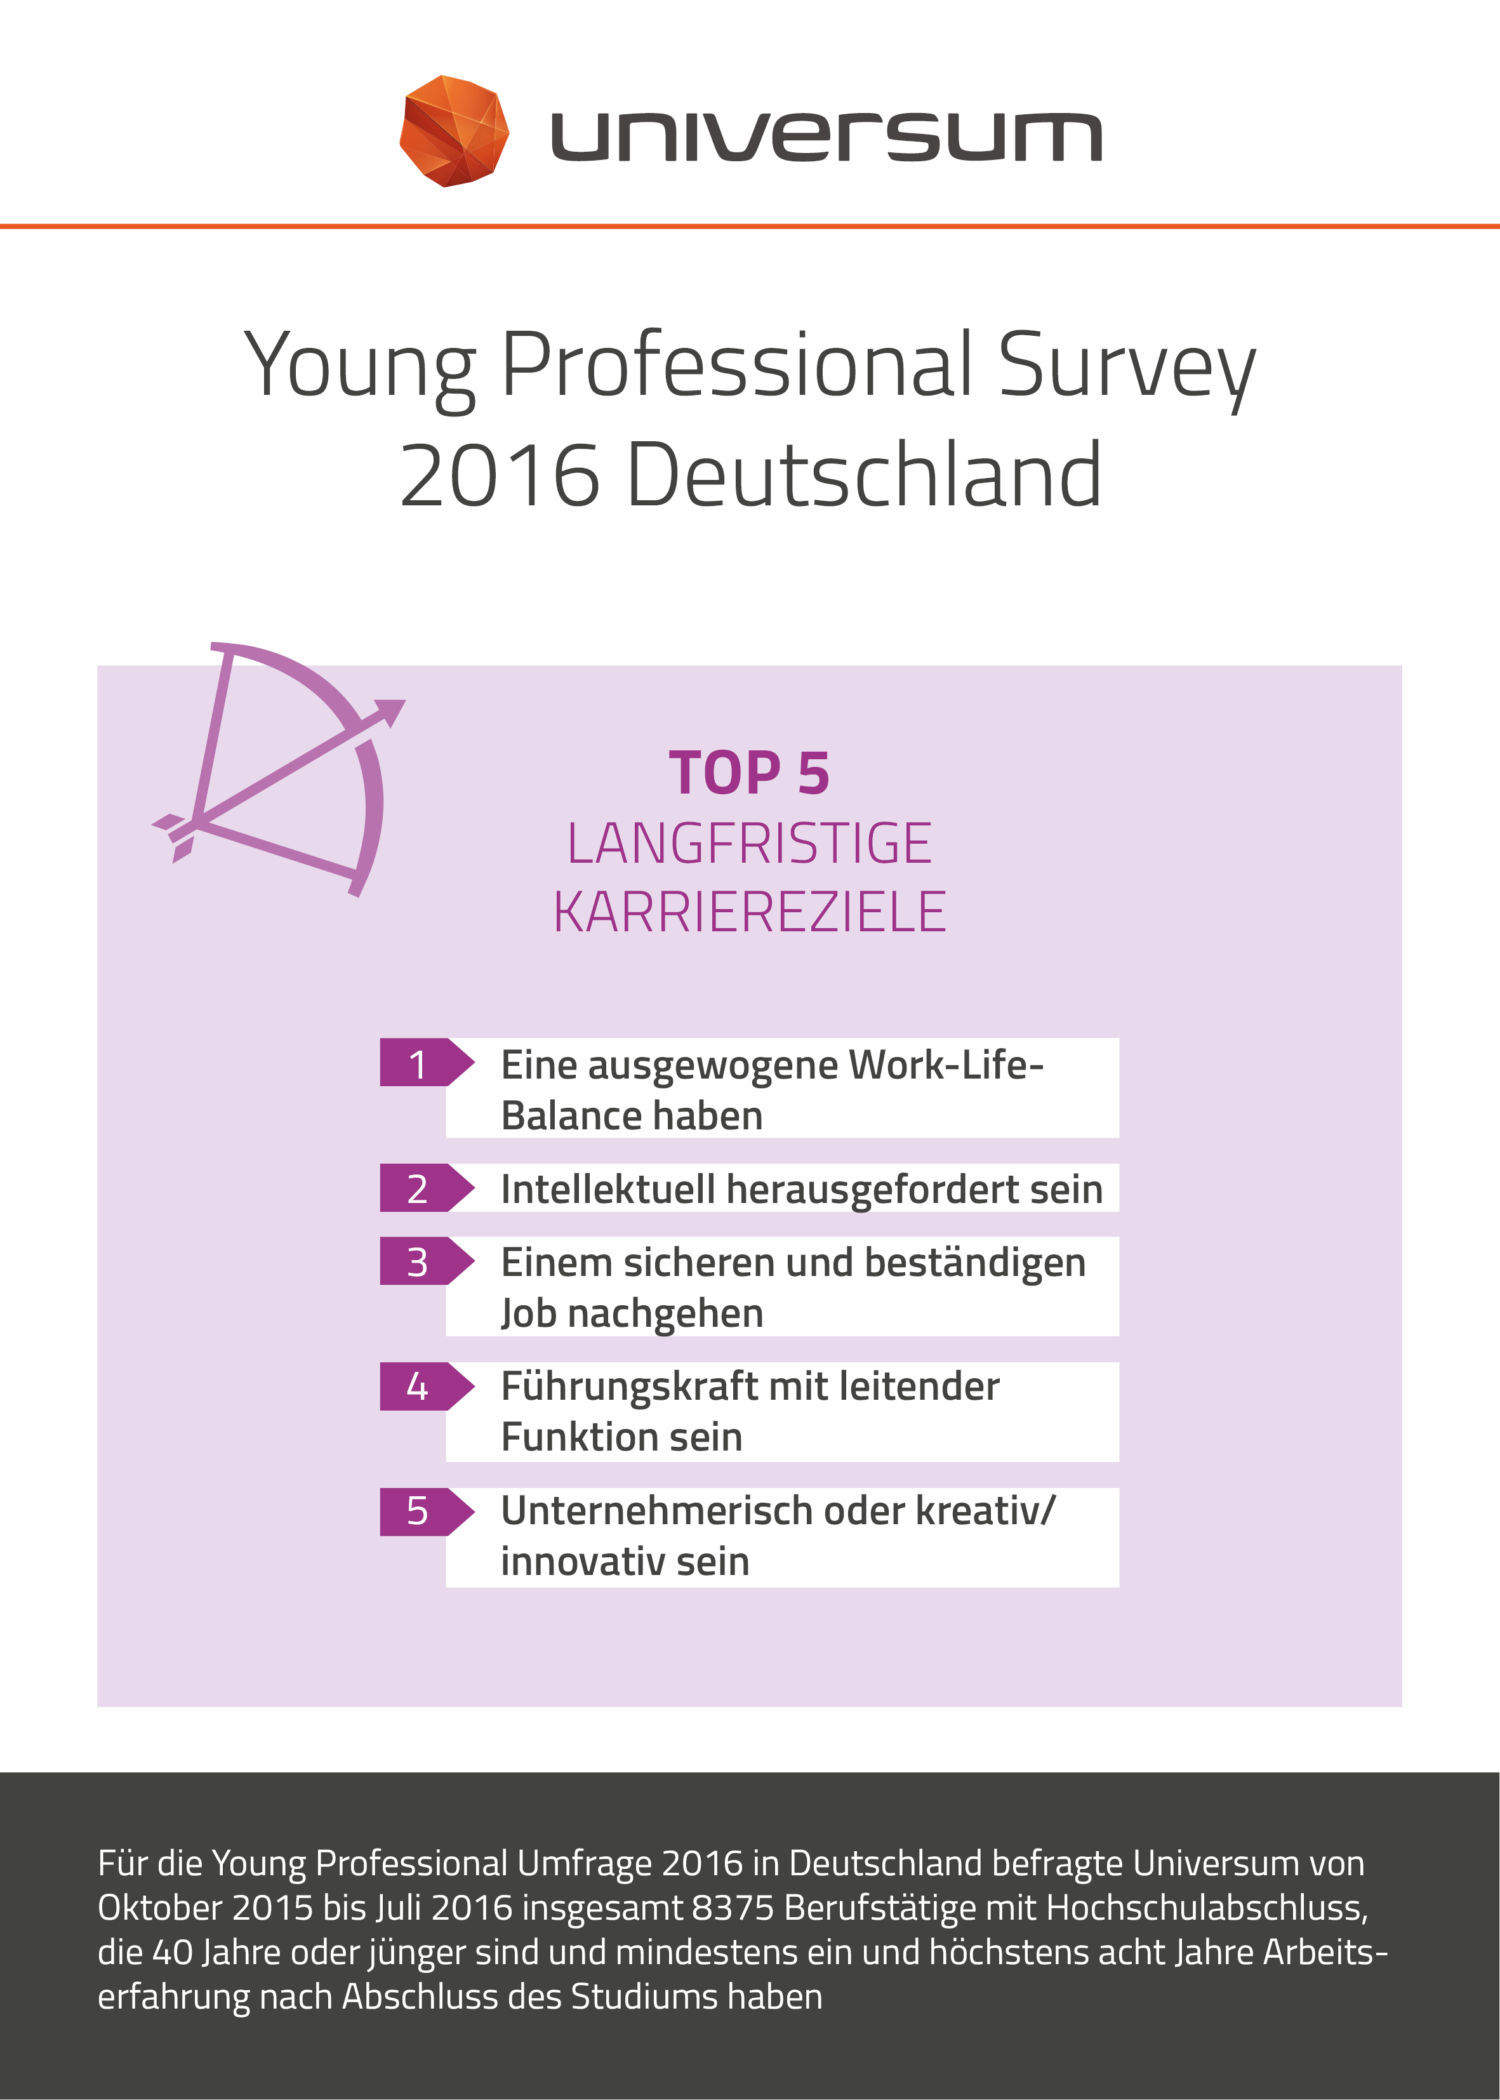 YPS DE 2016 langfristige Karriereziele